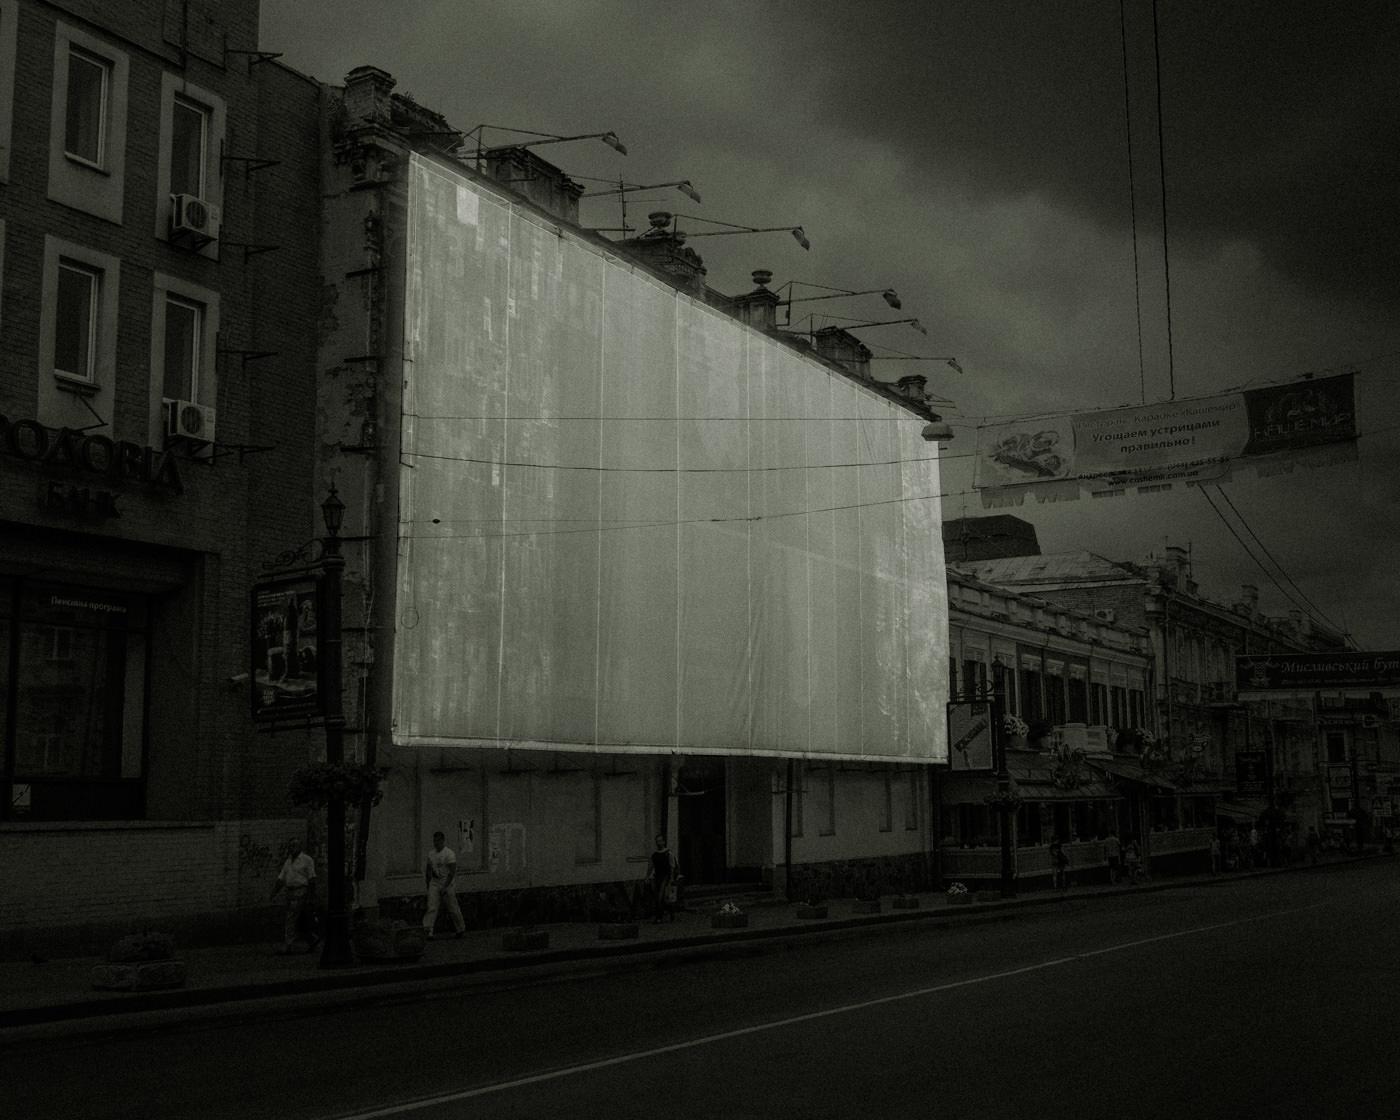 """Sunday, 02:03"" from the series Nylon Chrysalis, by William Mokrynski"